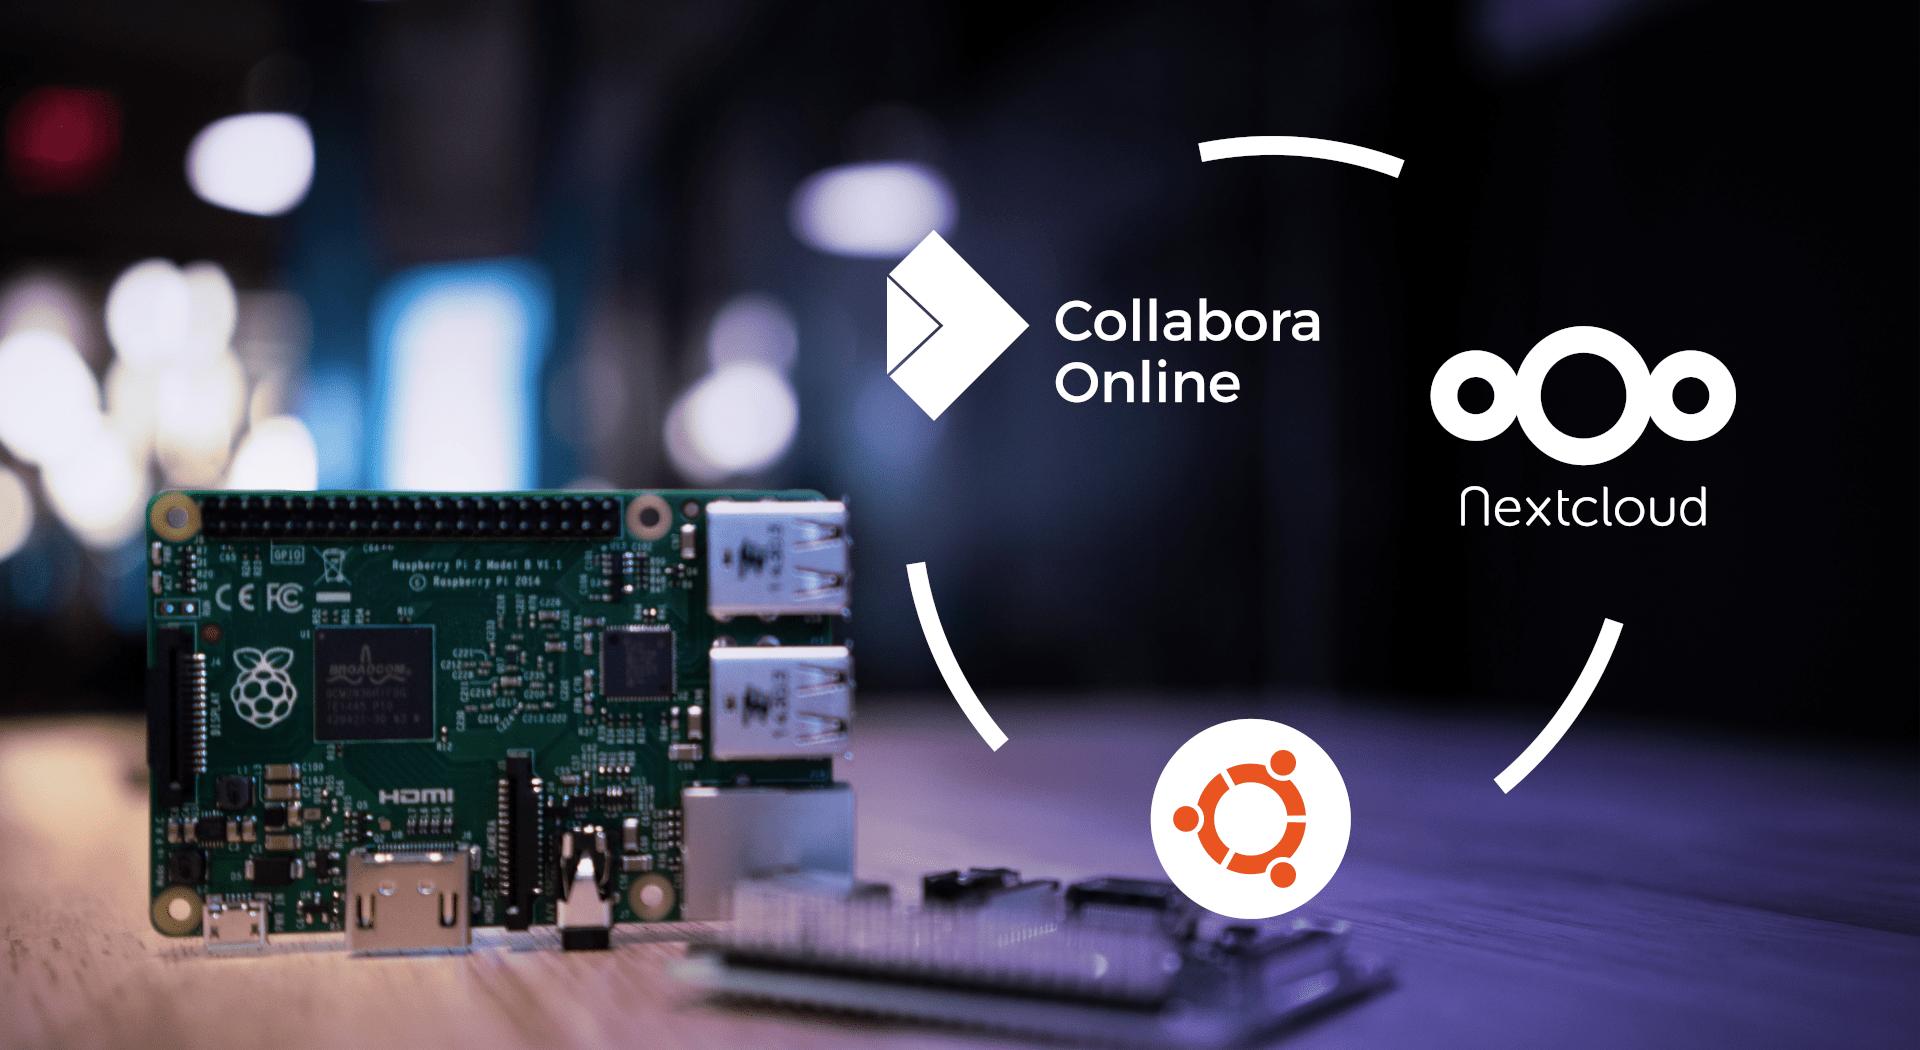 Logos of Nextcloud, Collabora and Canonical